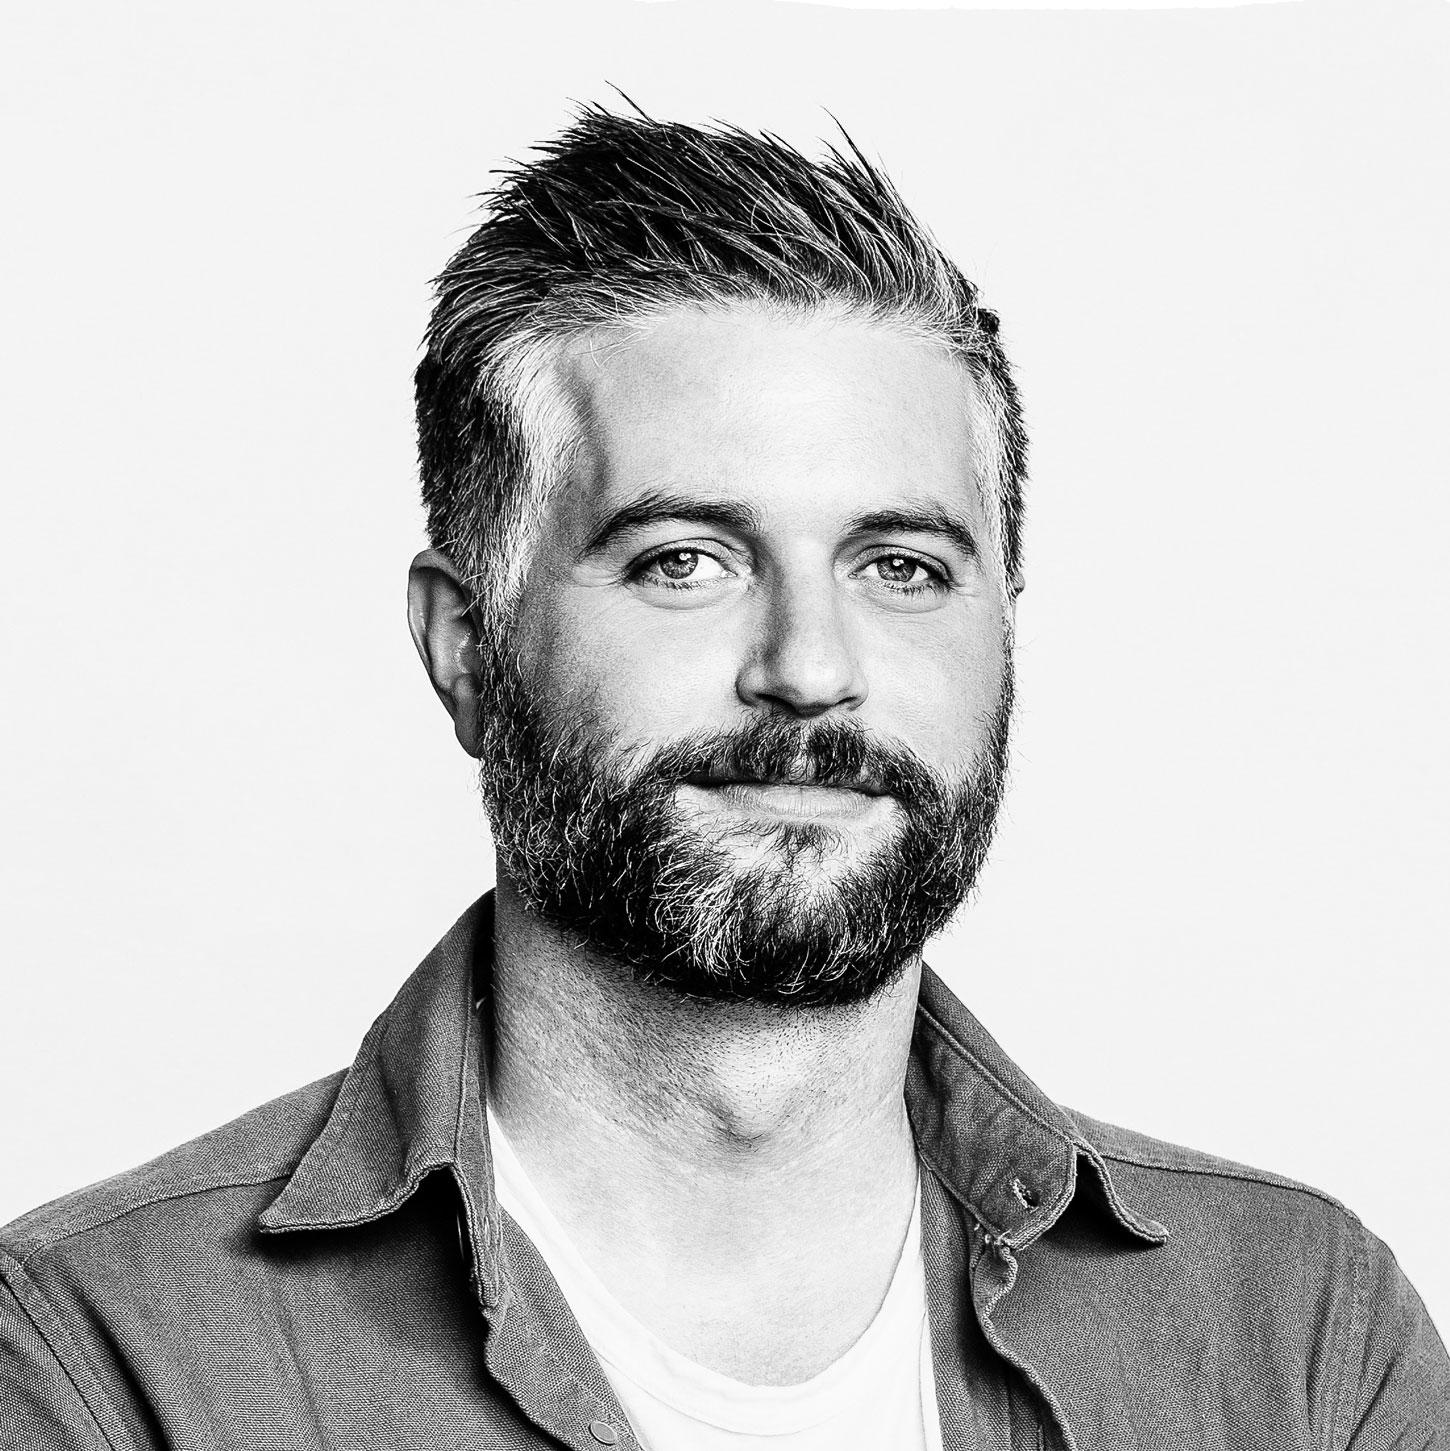 Ben O'Meara - Executive Director of Marketing and Brand Partnerships